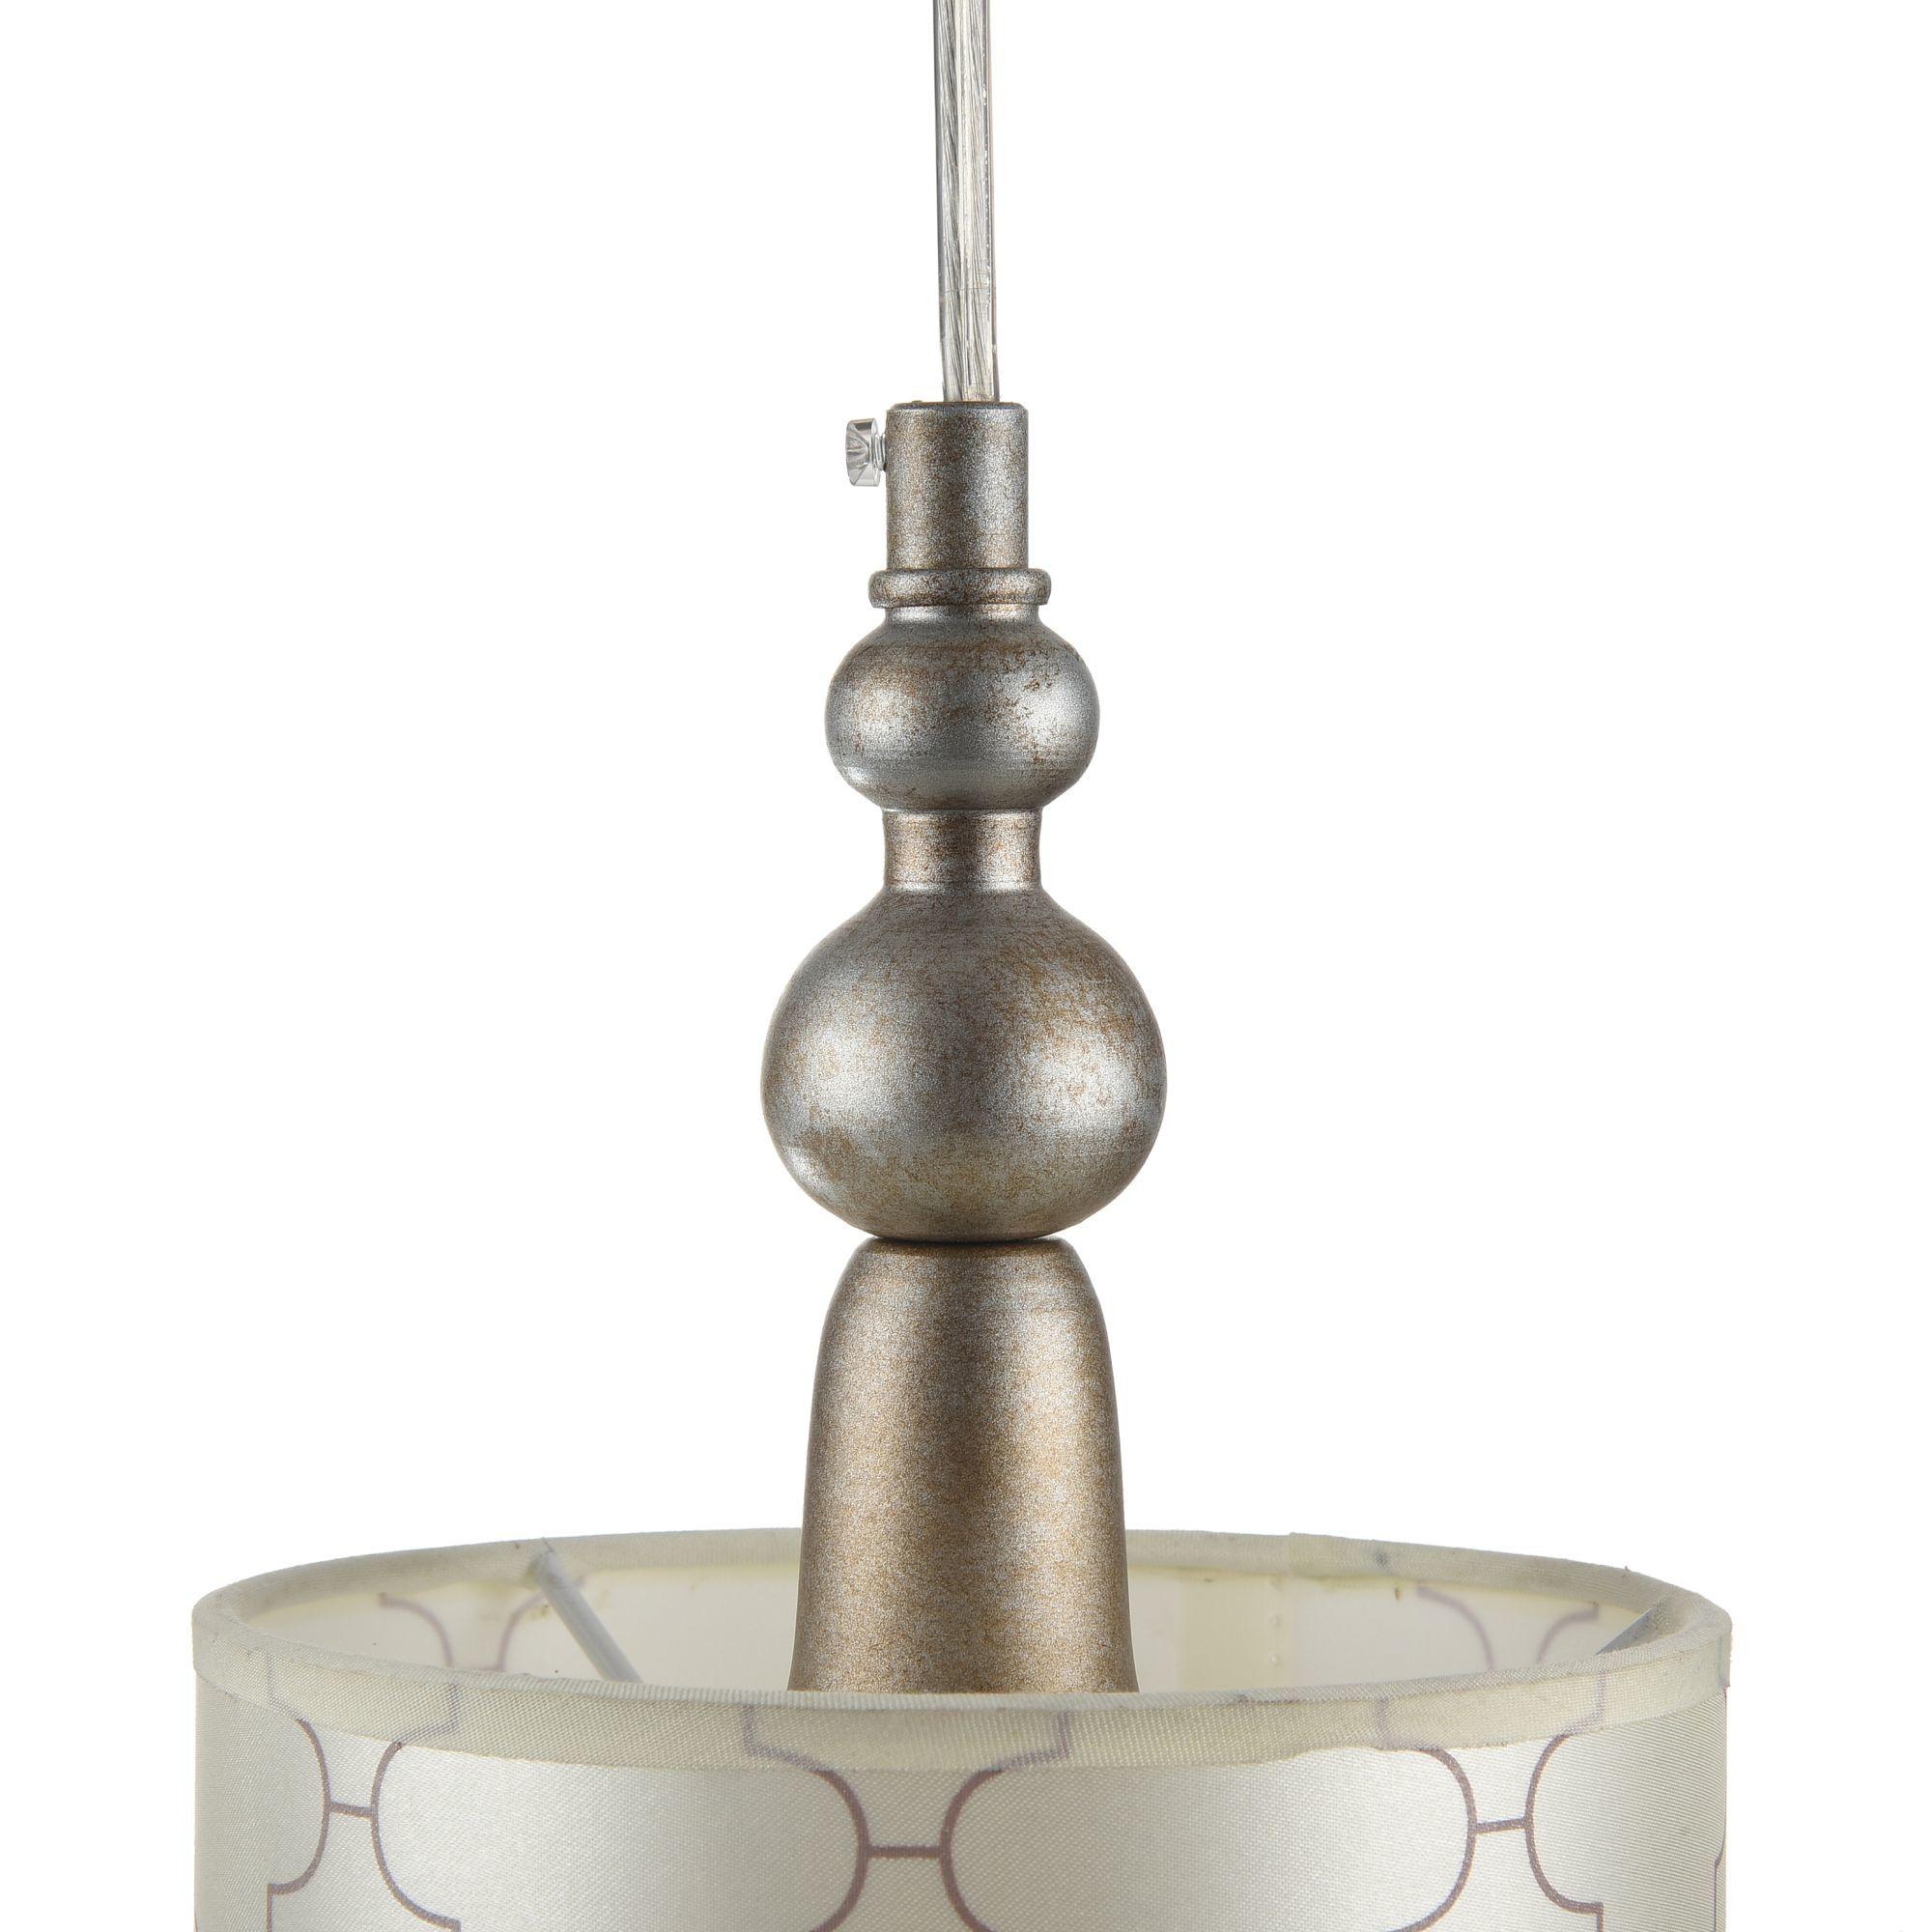 Подвесной светильник Maytoni Bience H018-PL-01-NG (dia018-22-ng), 1xE14x40W, серебро, бежевый, прозрачный, металл, текстиль, хрусталь - фото 7